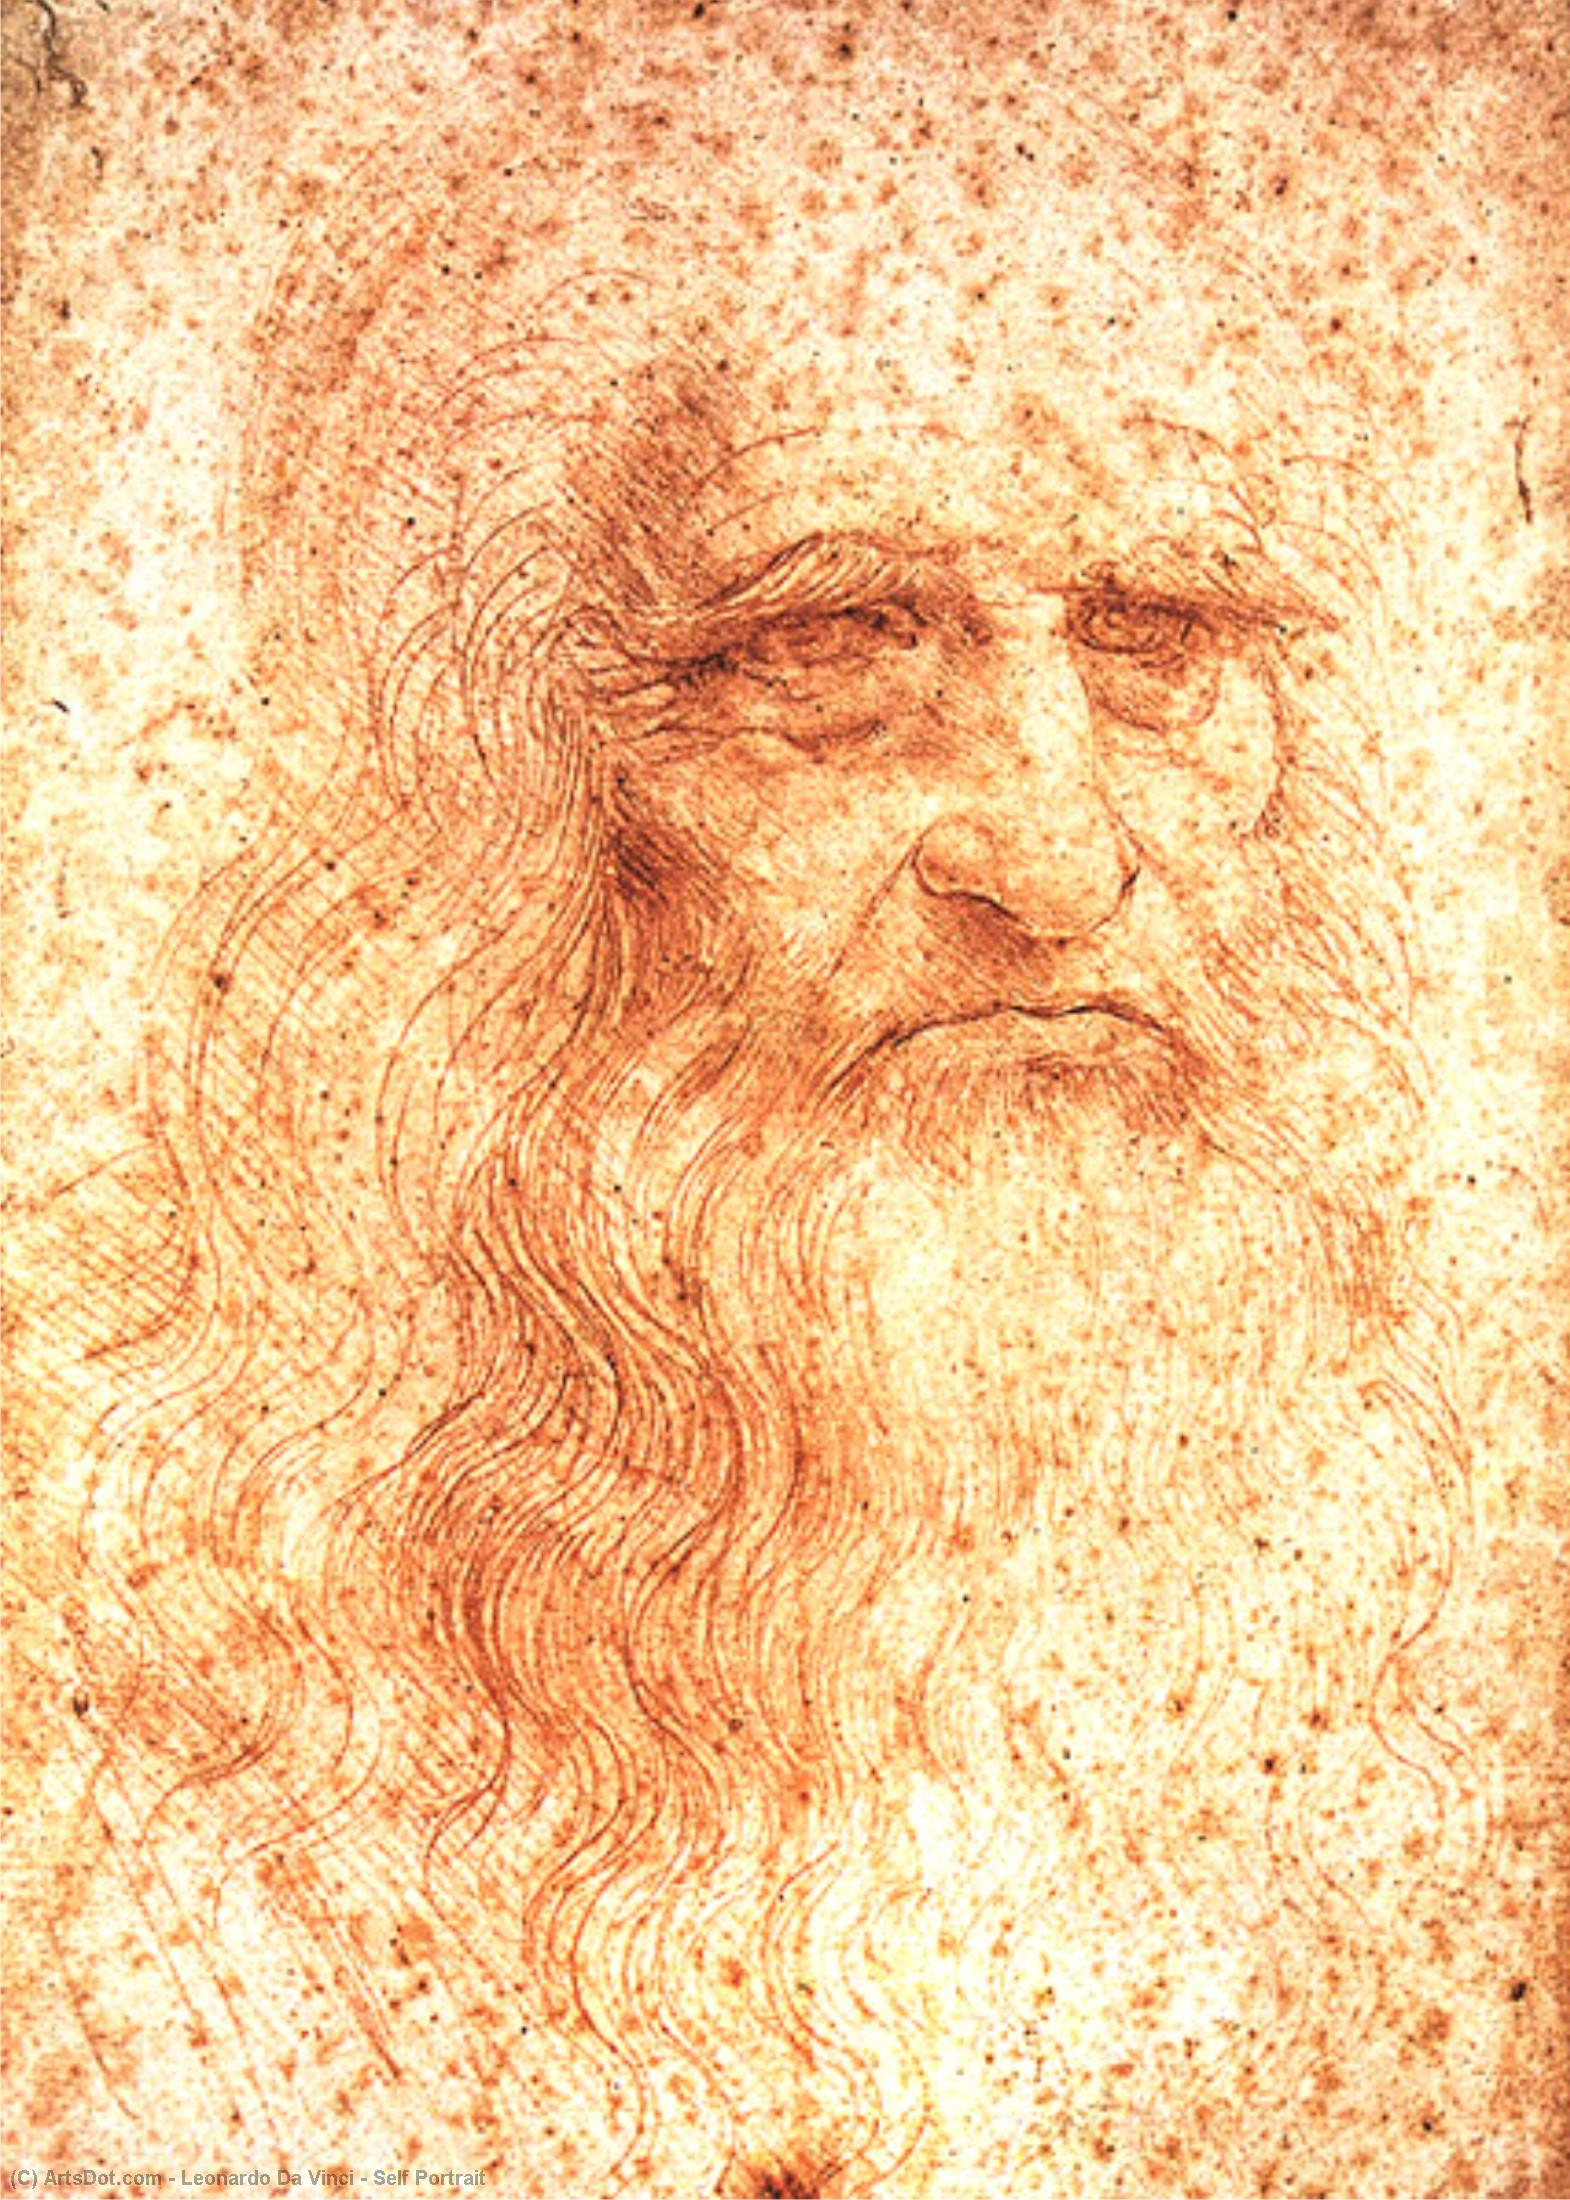 WikiOO.org - Güzel Sanatlar Ansiklopedisi - Resim, Resimler Leonardo Da Vinci - Self Portrait